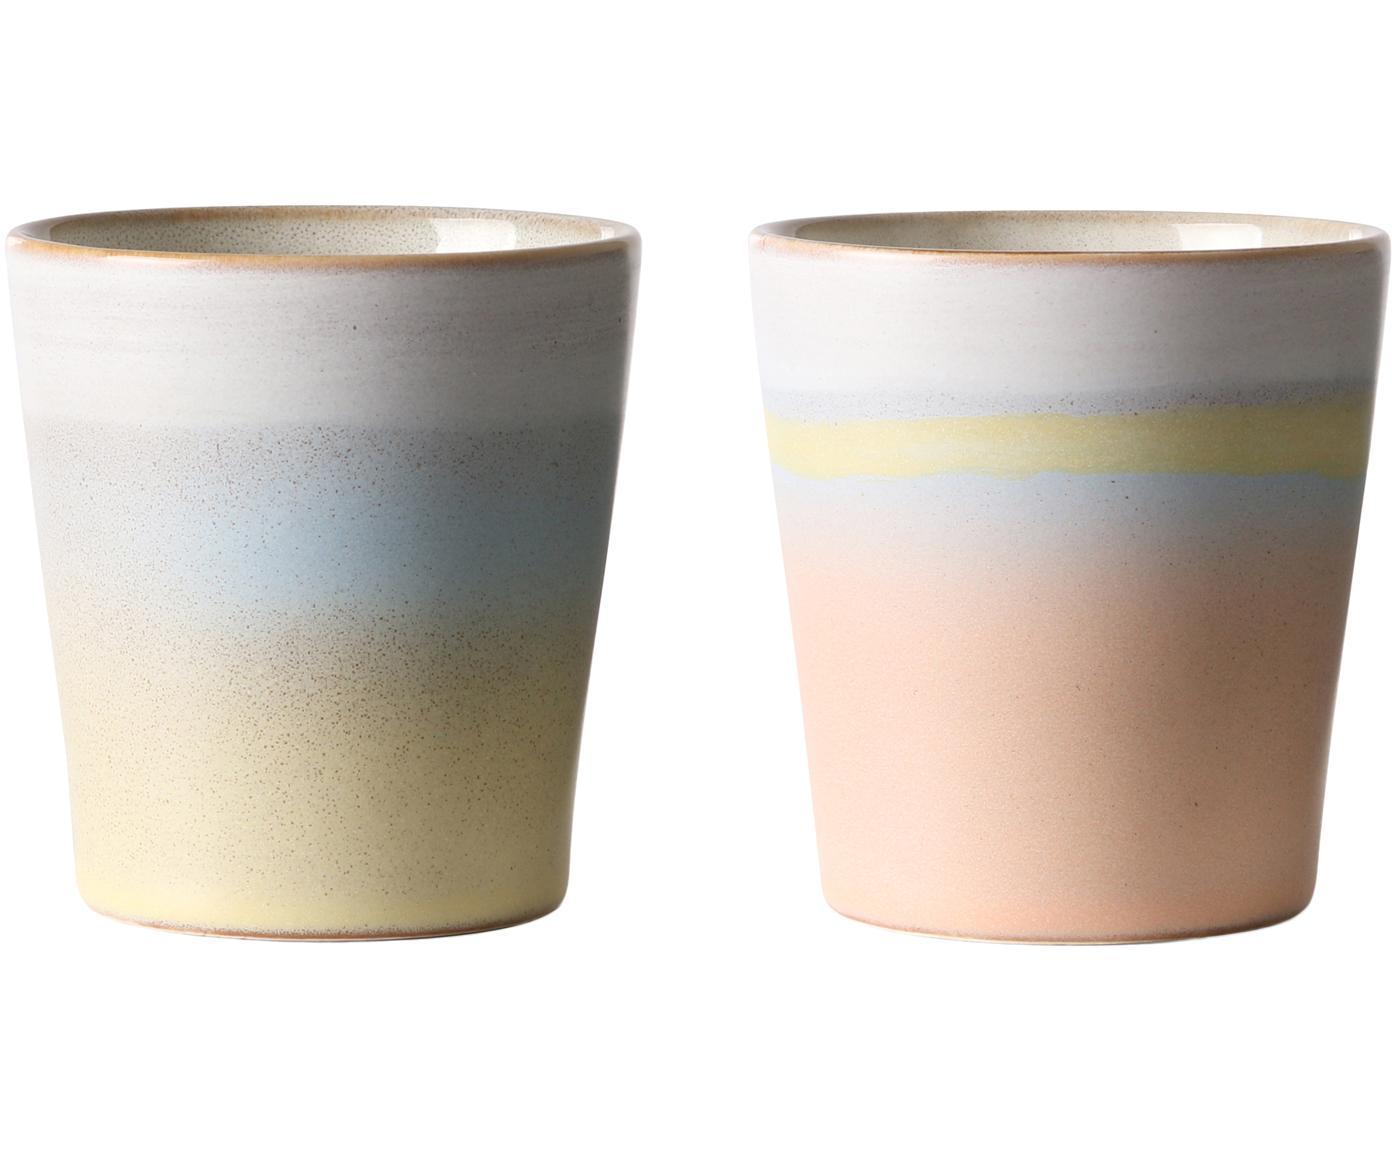 Set di 2 tazze fatte a mano 70's, Ceramica, Multicolore, Ø 8 x Alt. 8 cm